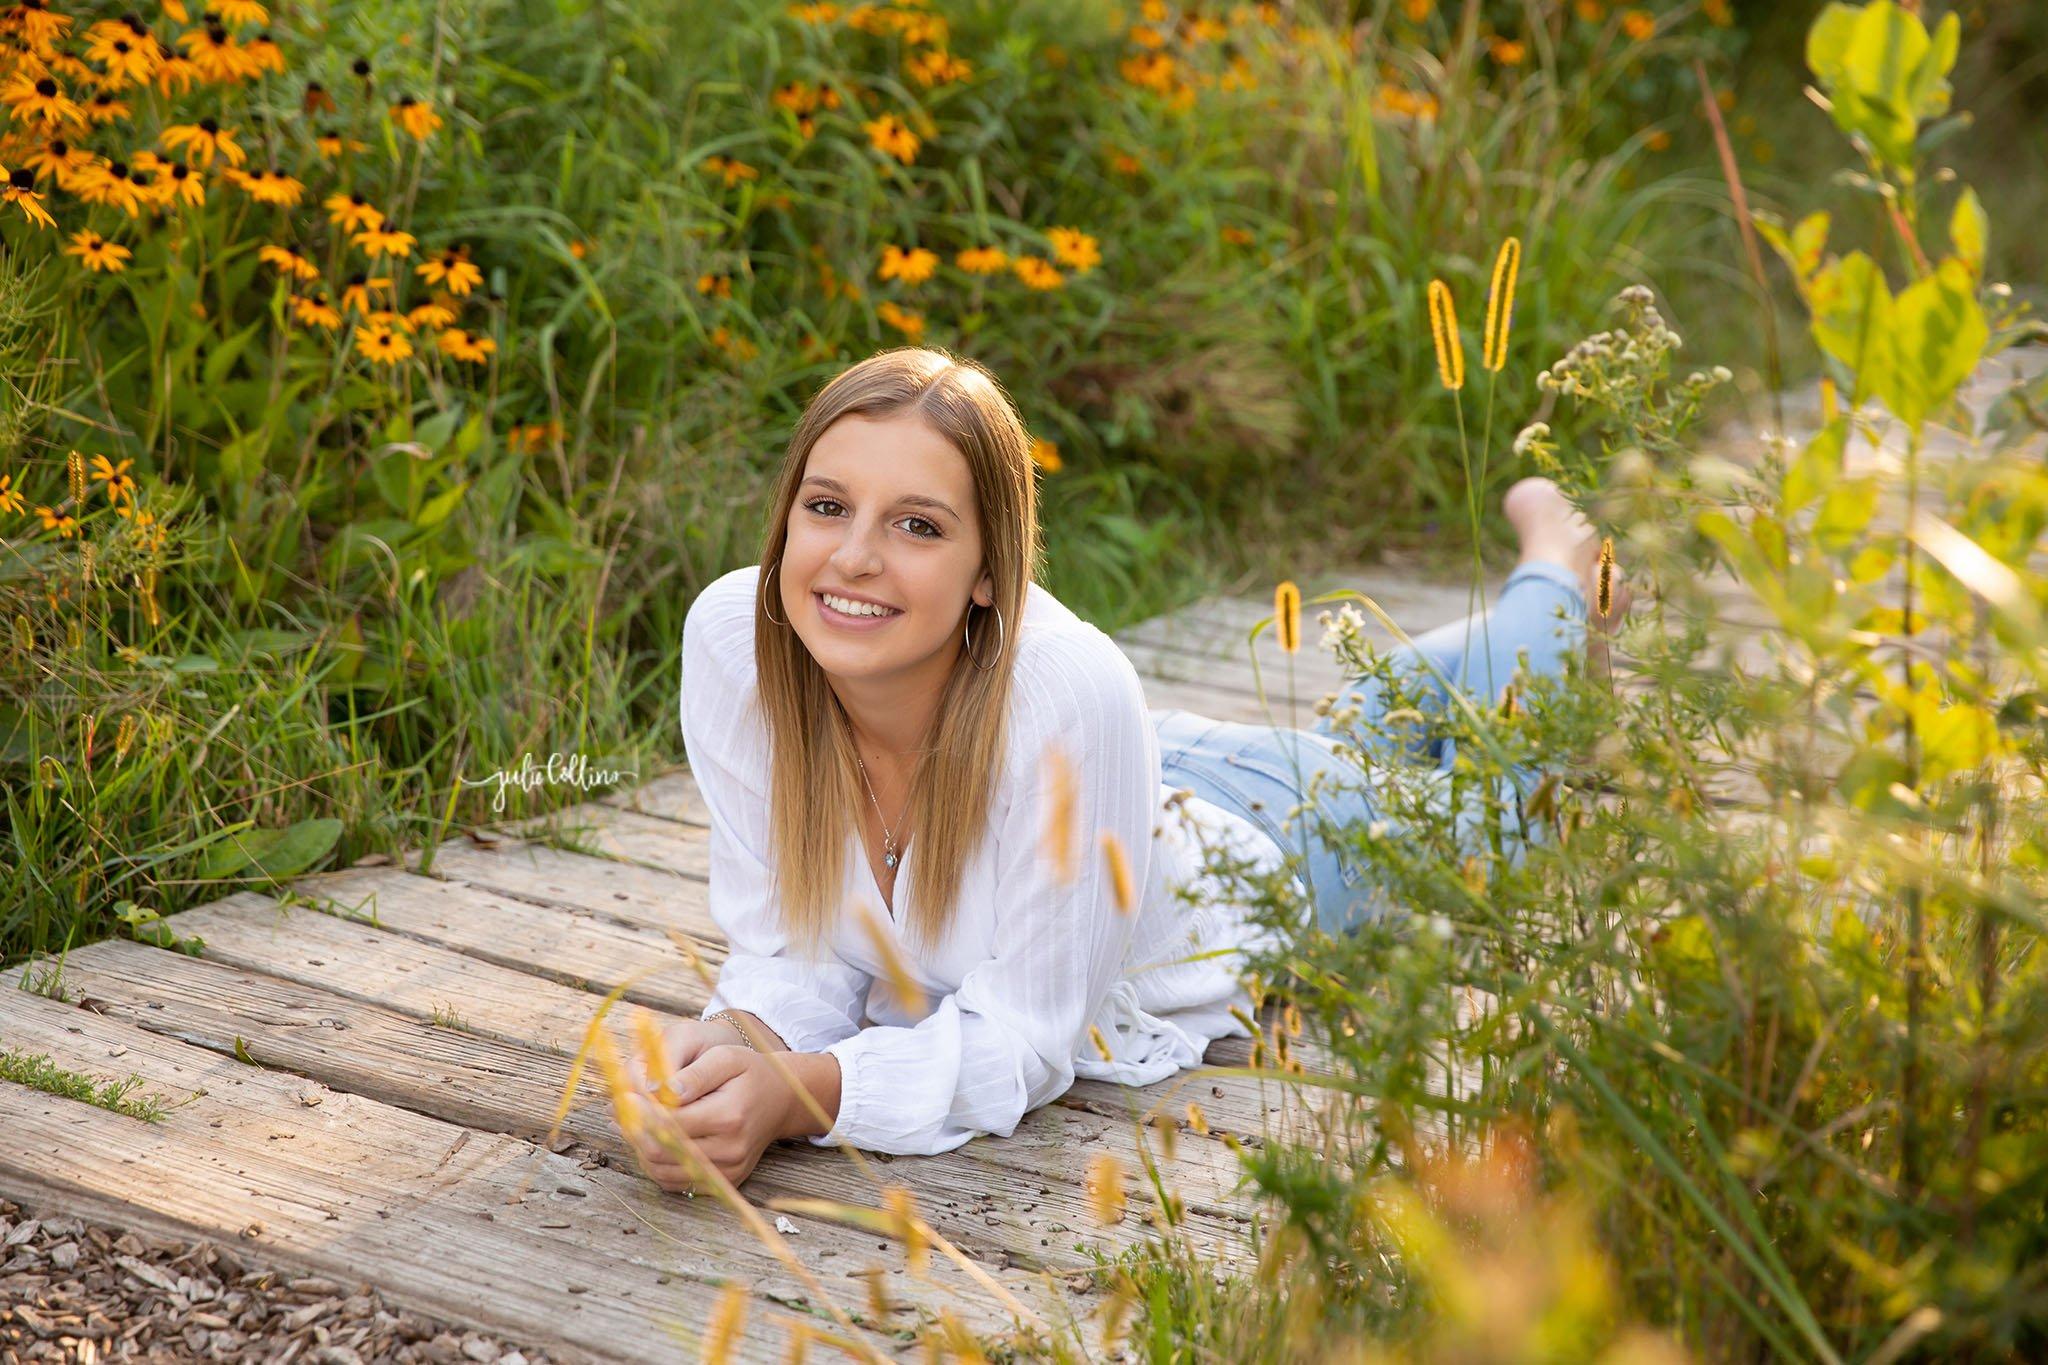 Senior girl in high school lying in flowers